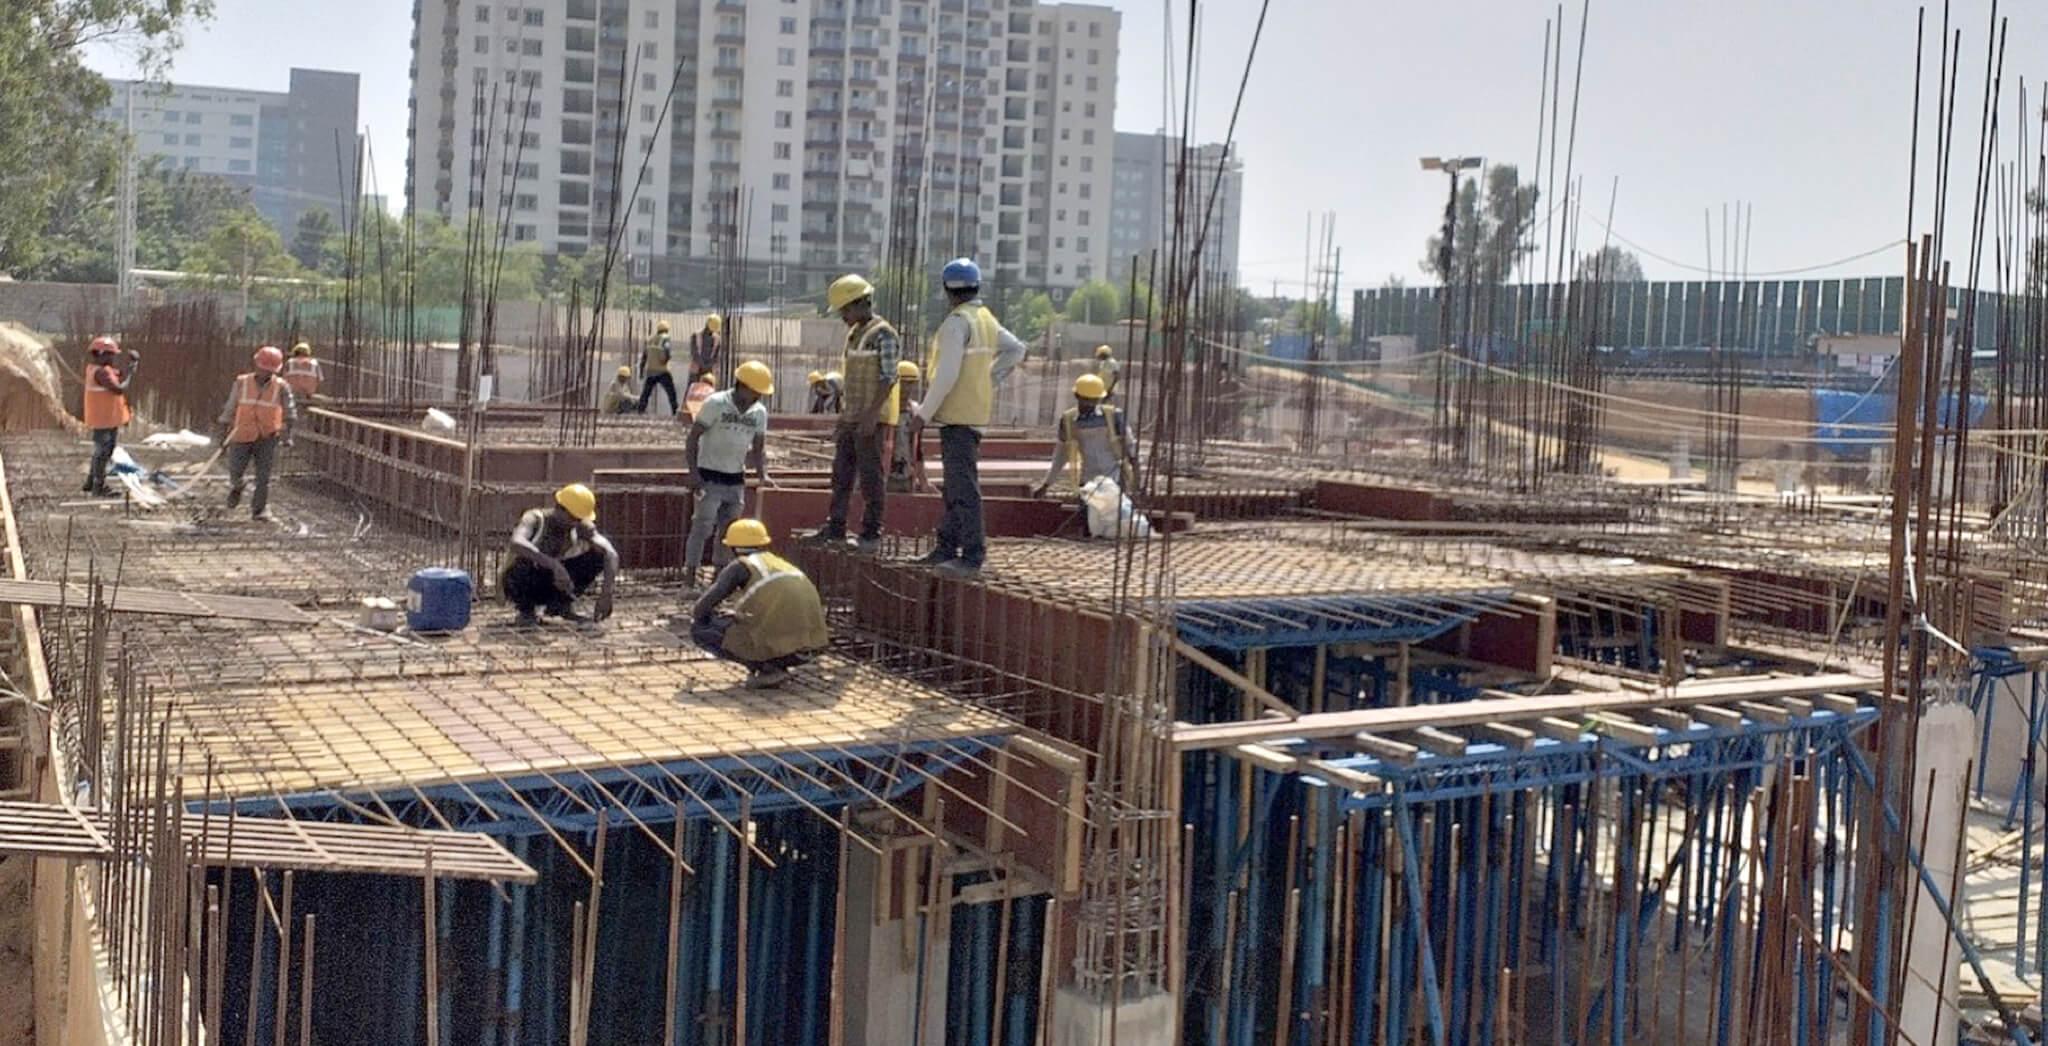 Nov 2019 - North side view: S Block—Ground floor slab reinforcement work-in-progress